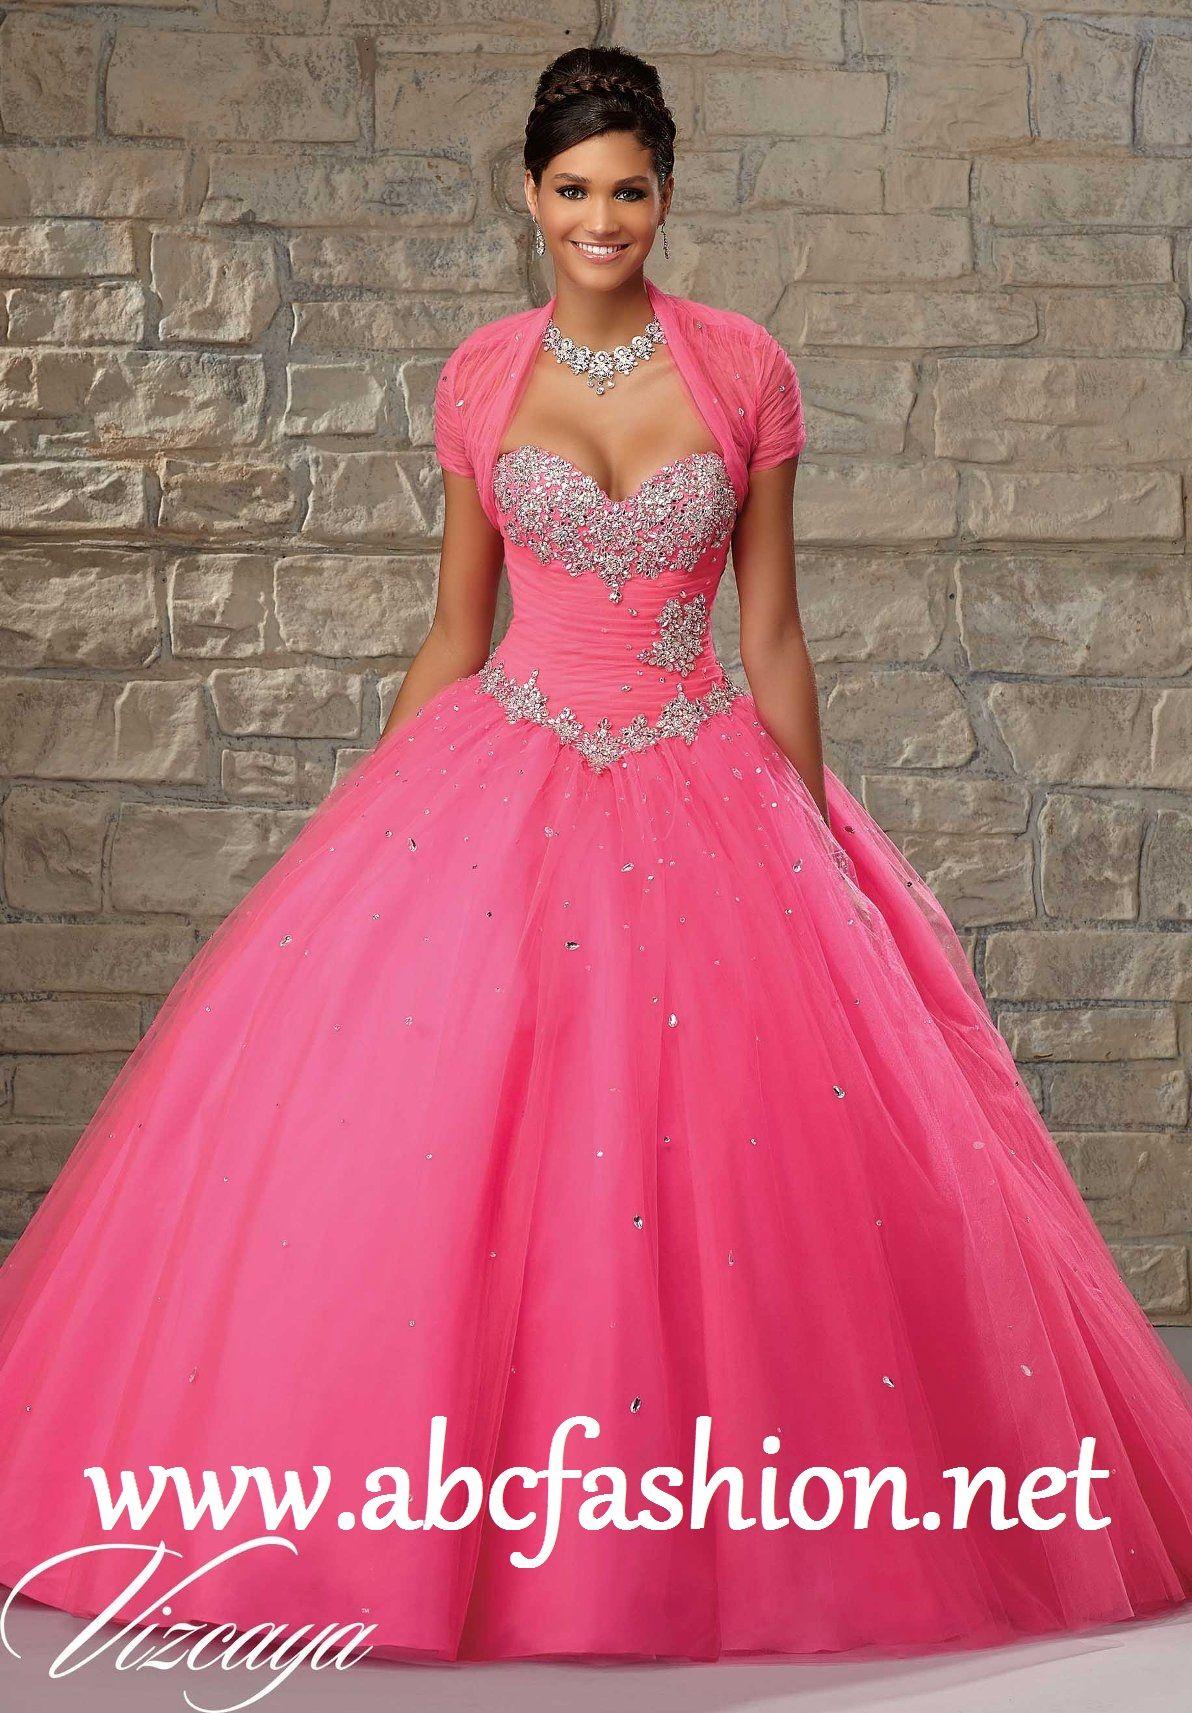 Mori Lee Quinceanera Dresses Style 89028 Colors: Aqua, Blush, Pink ...